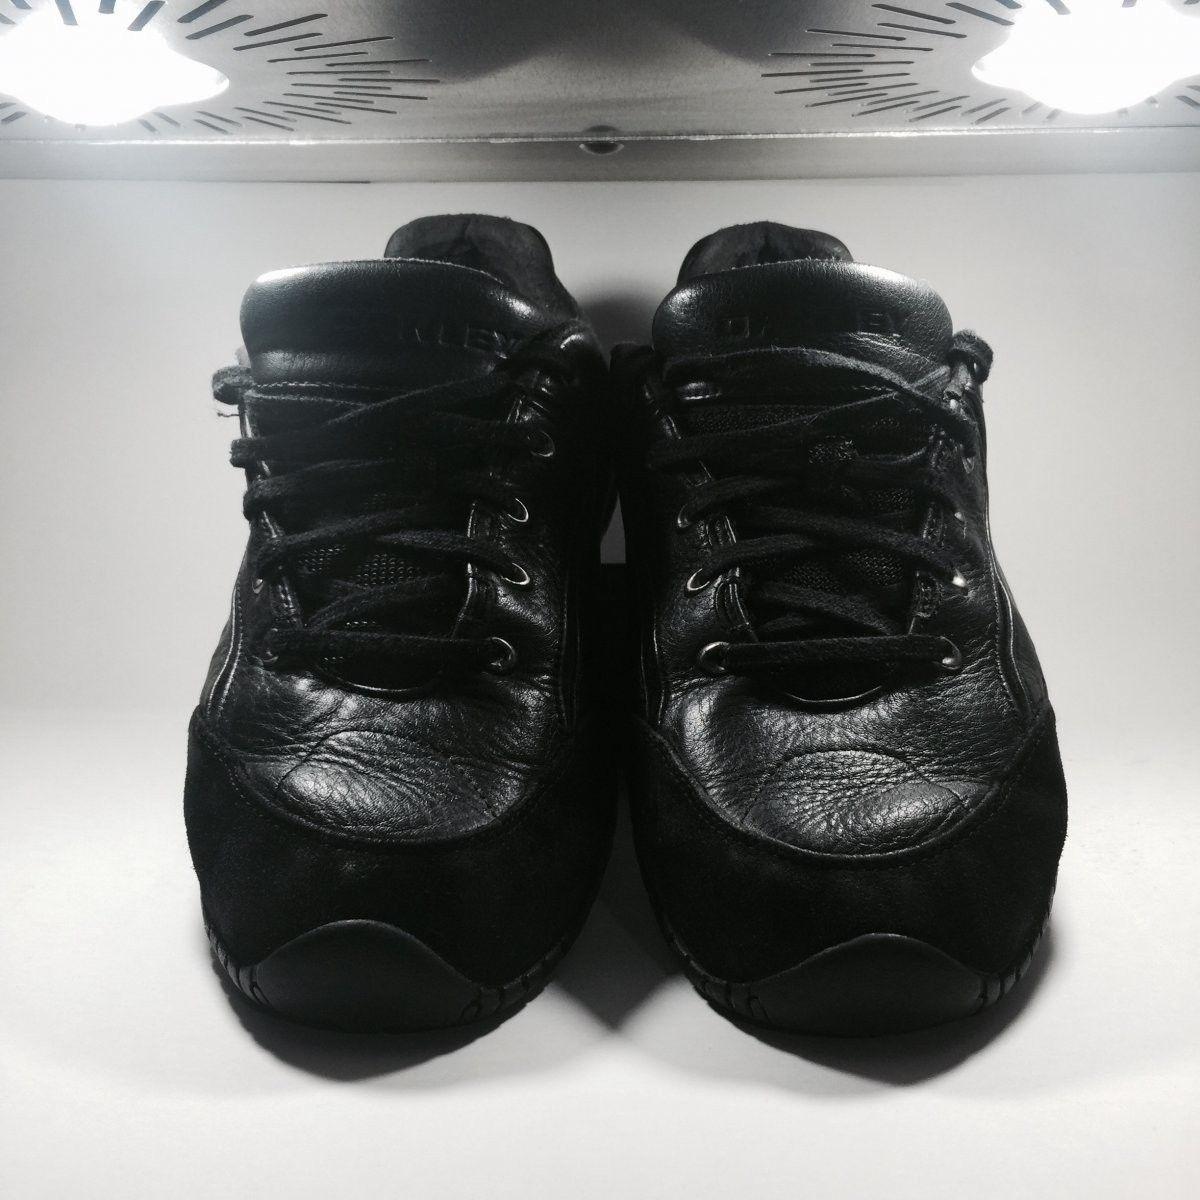 Oakley Shoes Size 12.5 Original Rip Cords Black/Chrome - Oakley Rip Cord Black Chrome (2).jpg